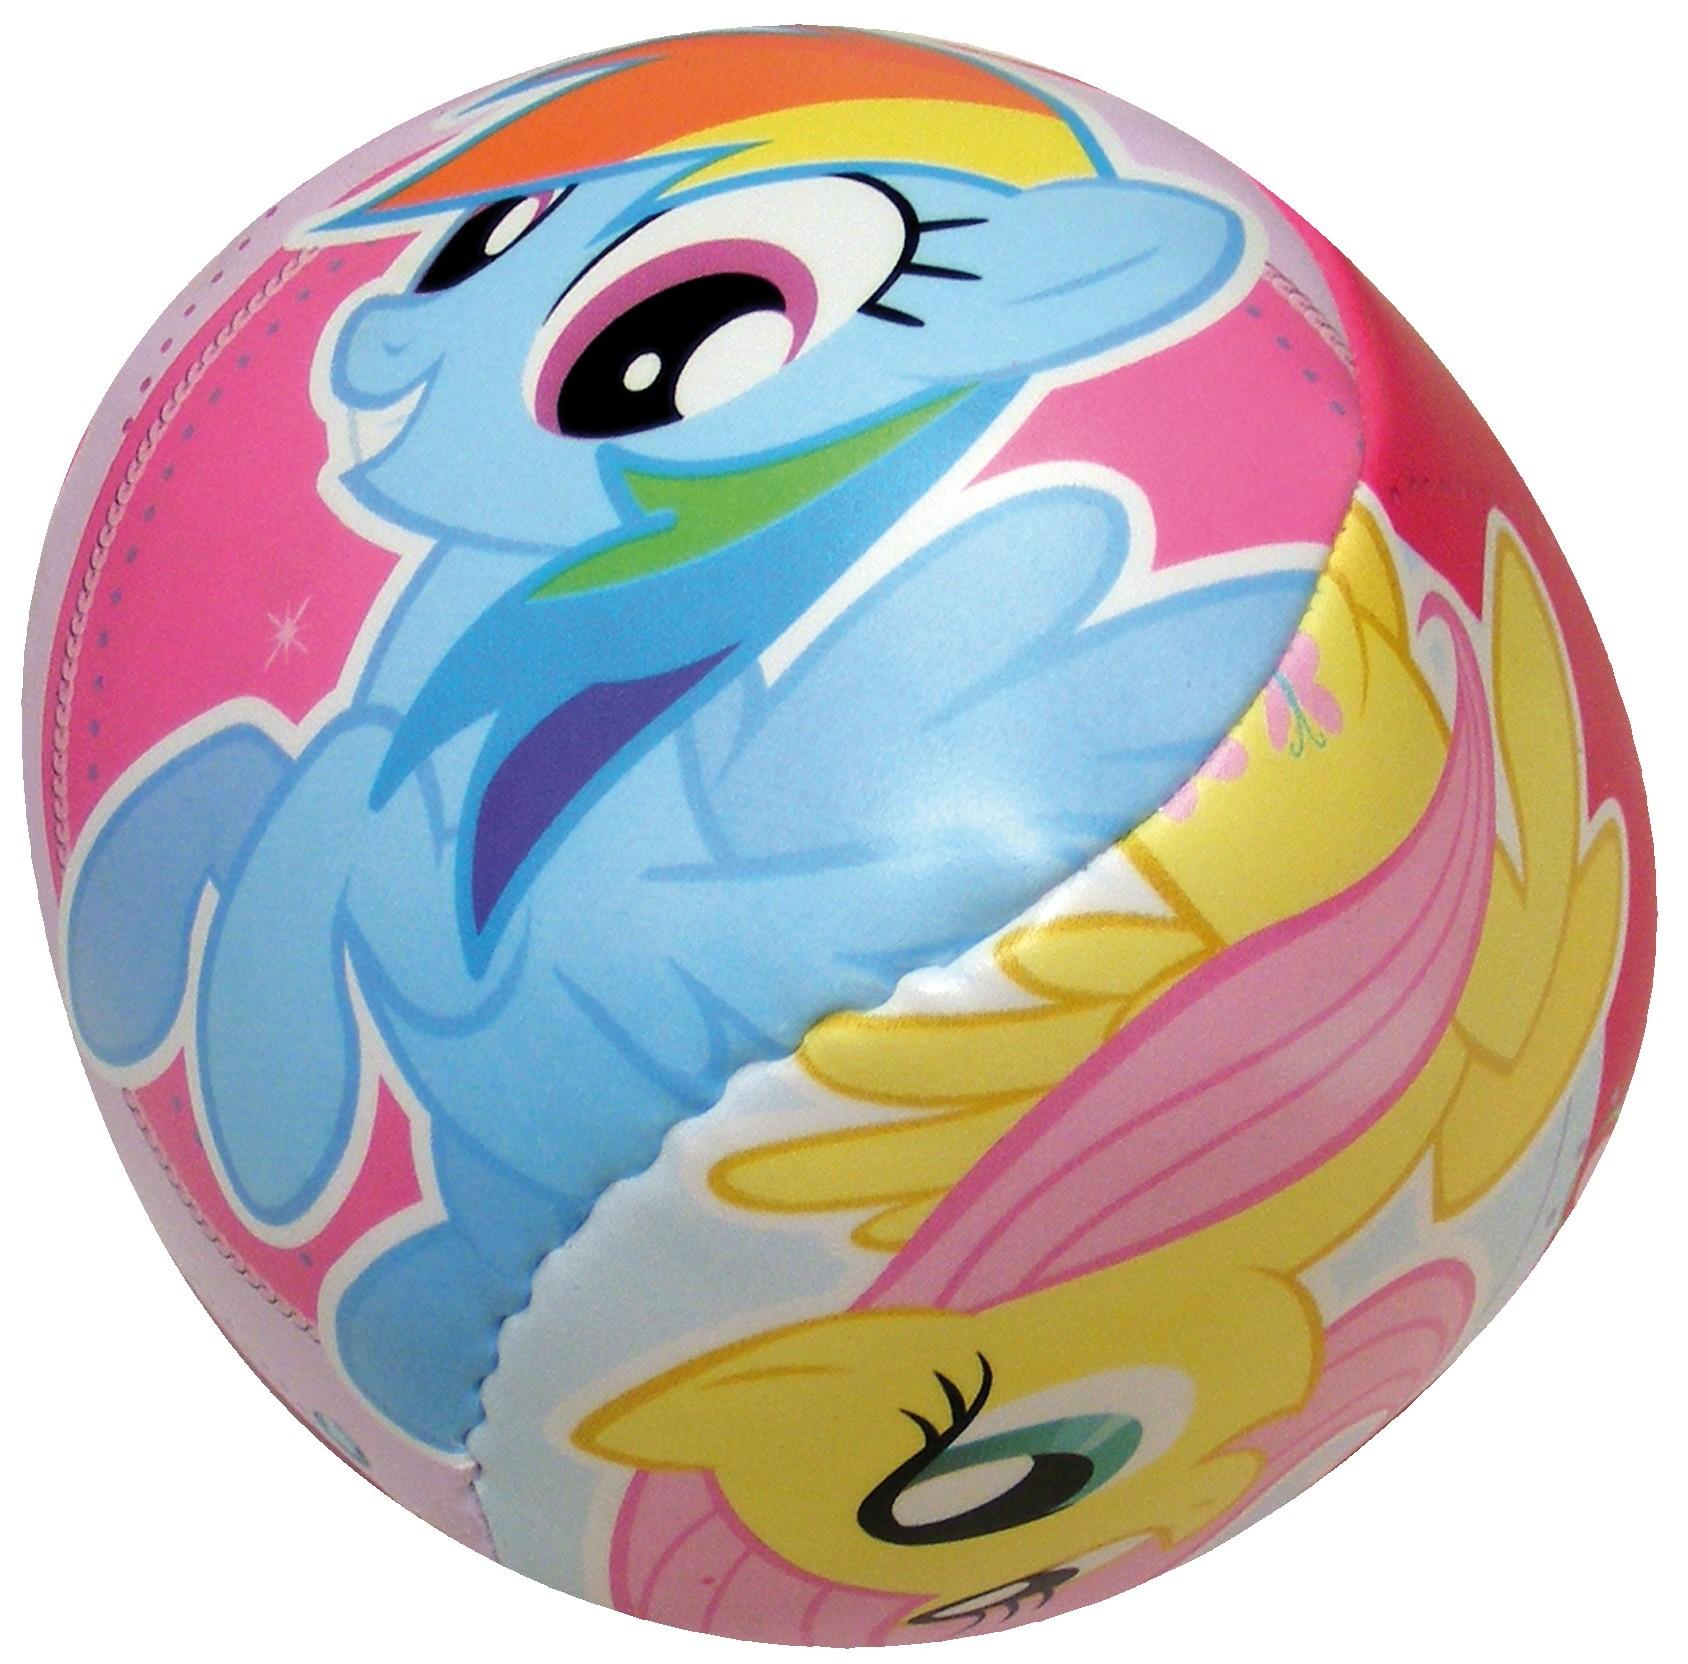 Мячи John Мяч John «Моя маленькая пони» мягкий 10 см john мяч моя маленькая пони 100 мм john